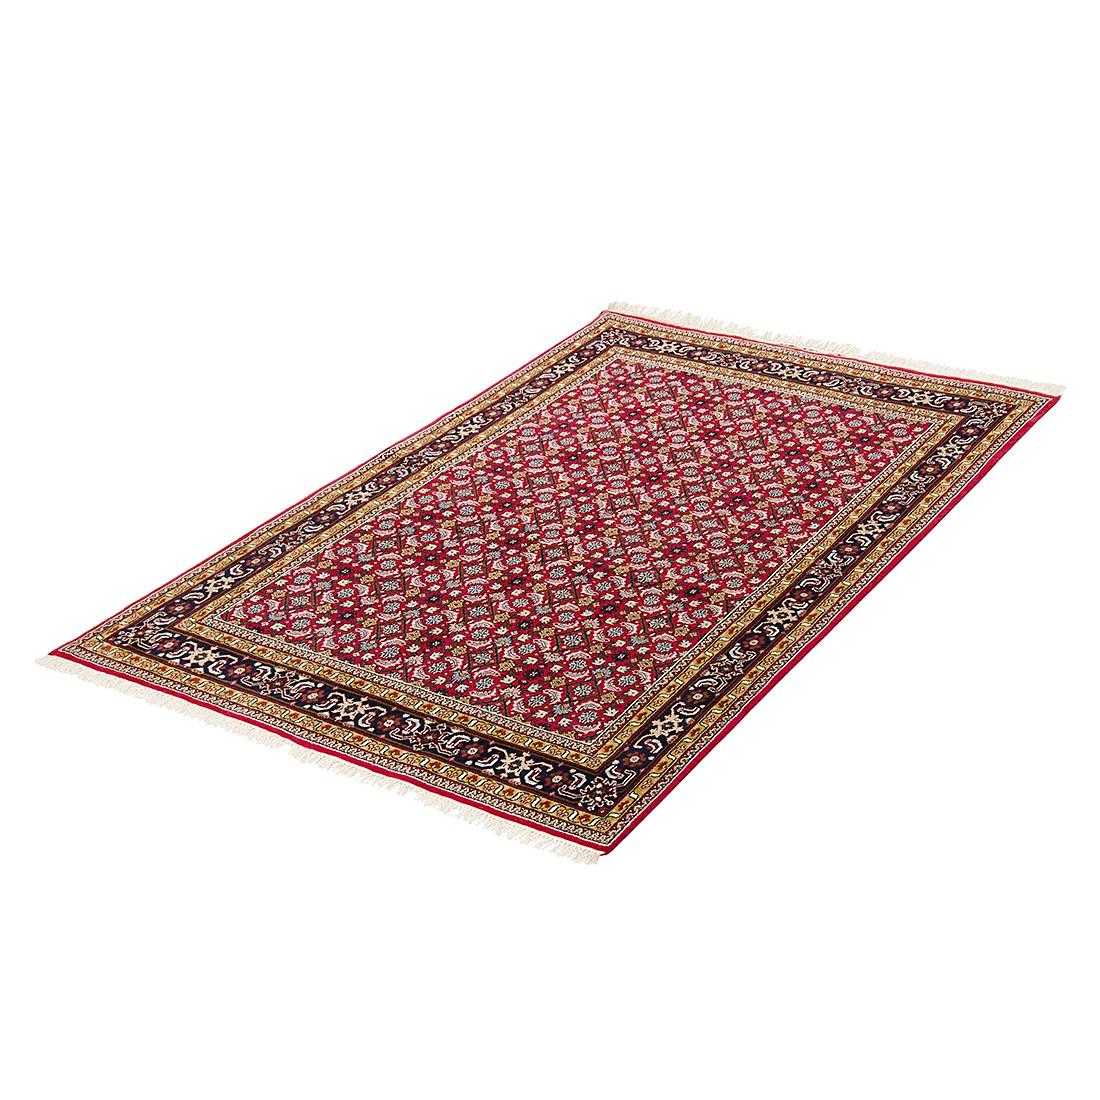 Teppich Matura Bidjar - Rot - 200cm x 300cm, Parwis